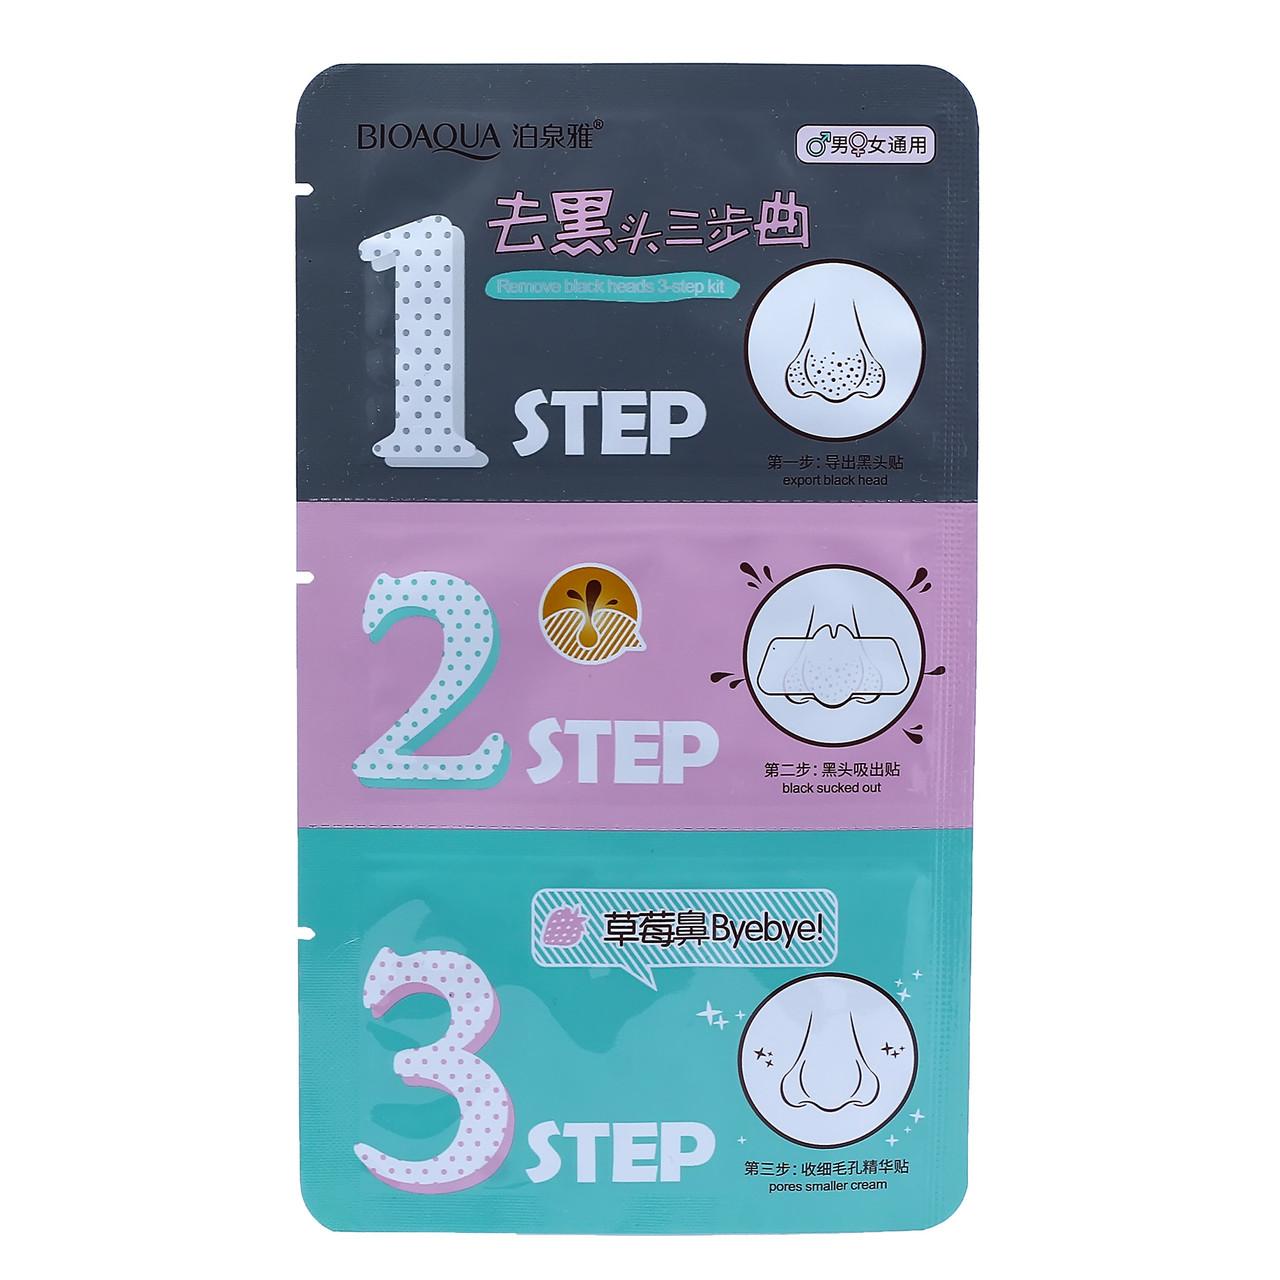 Очищающие полоски для носа BIOAQUA 3 Step